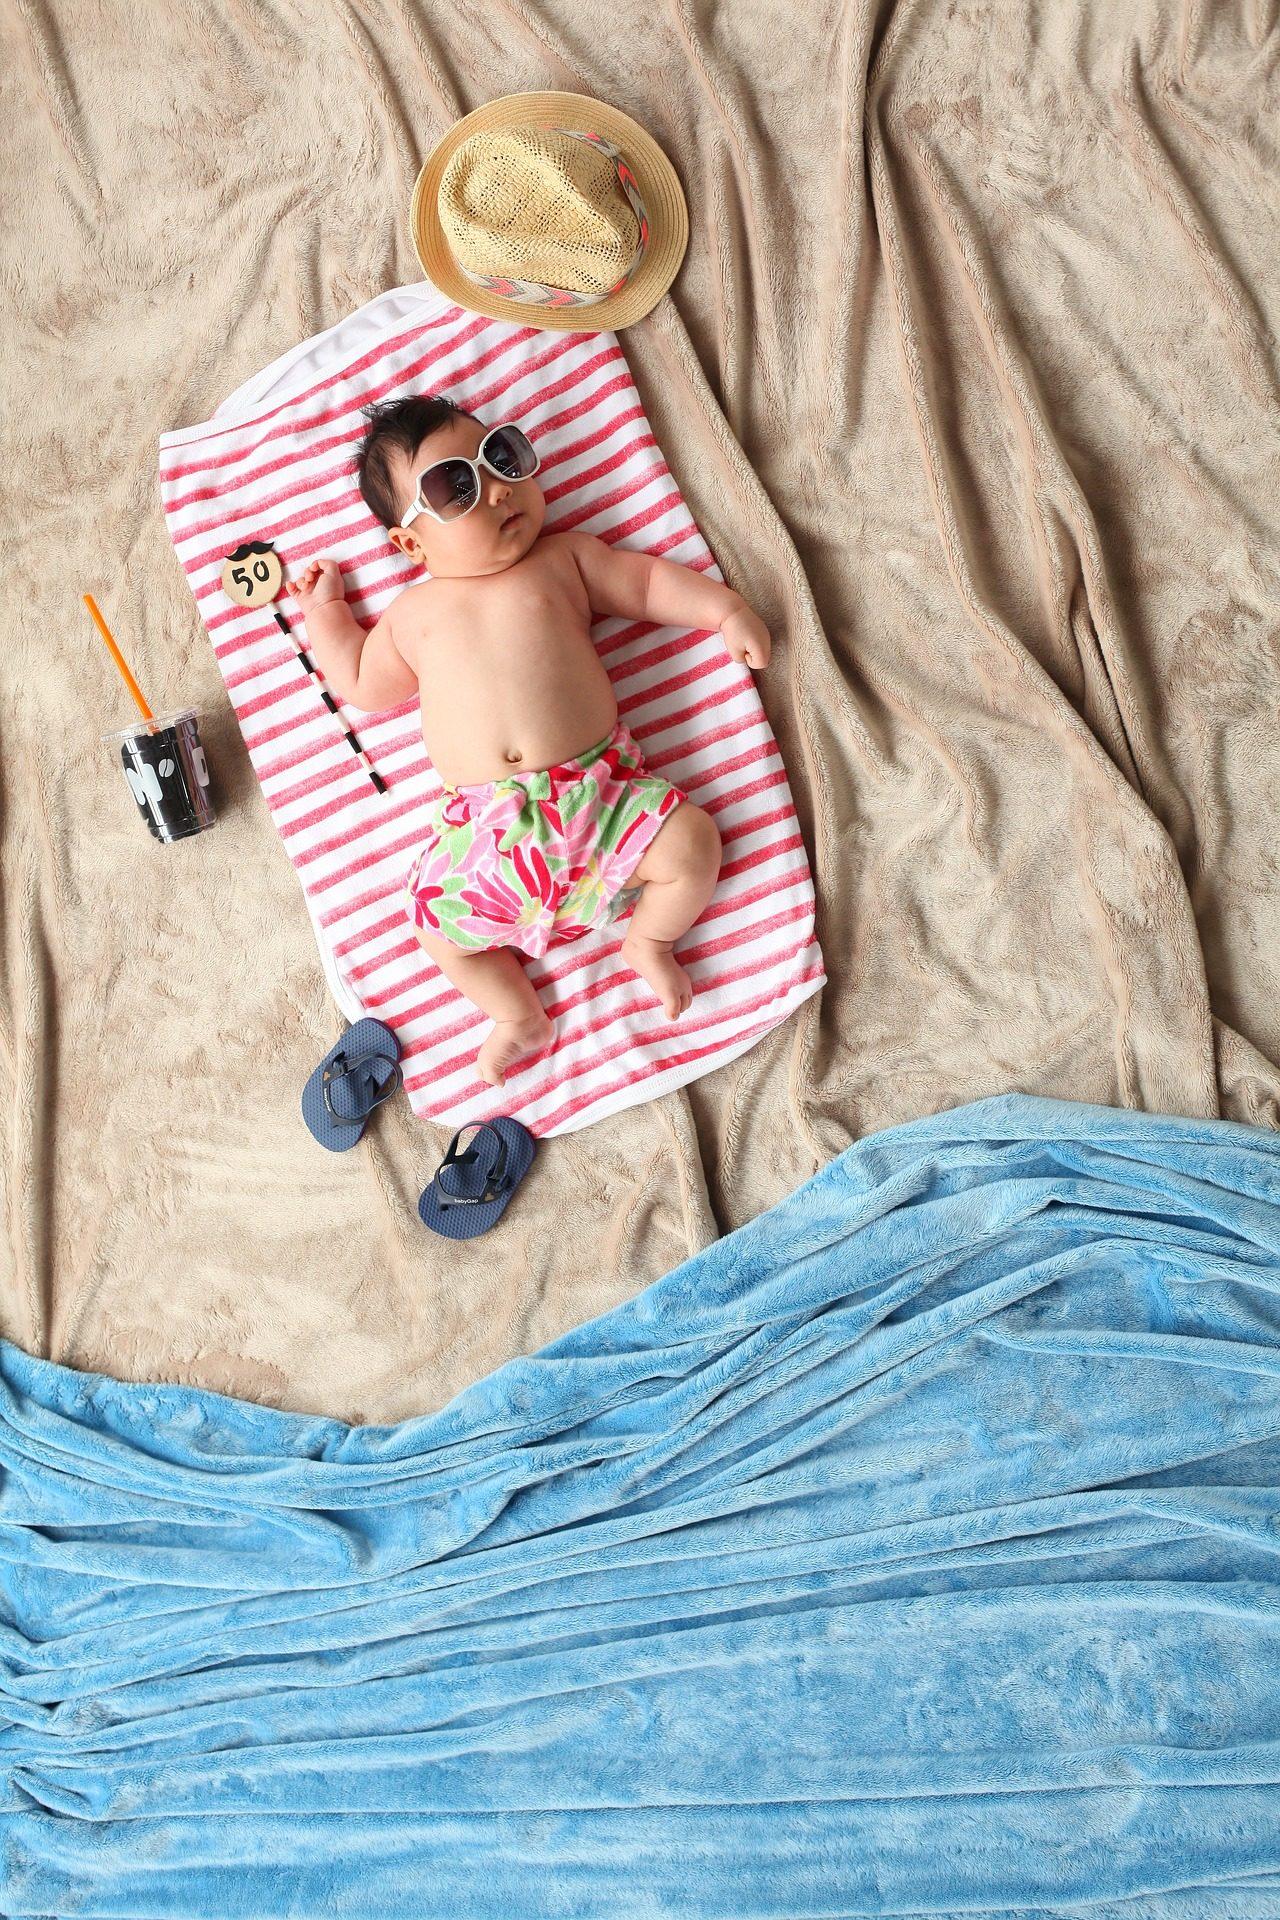 été, bebé, endormi, Plage, simulation - Fonds d'écran HD - Professor-falken.com